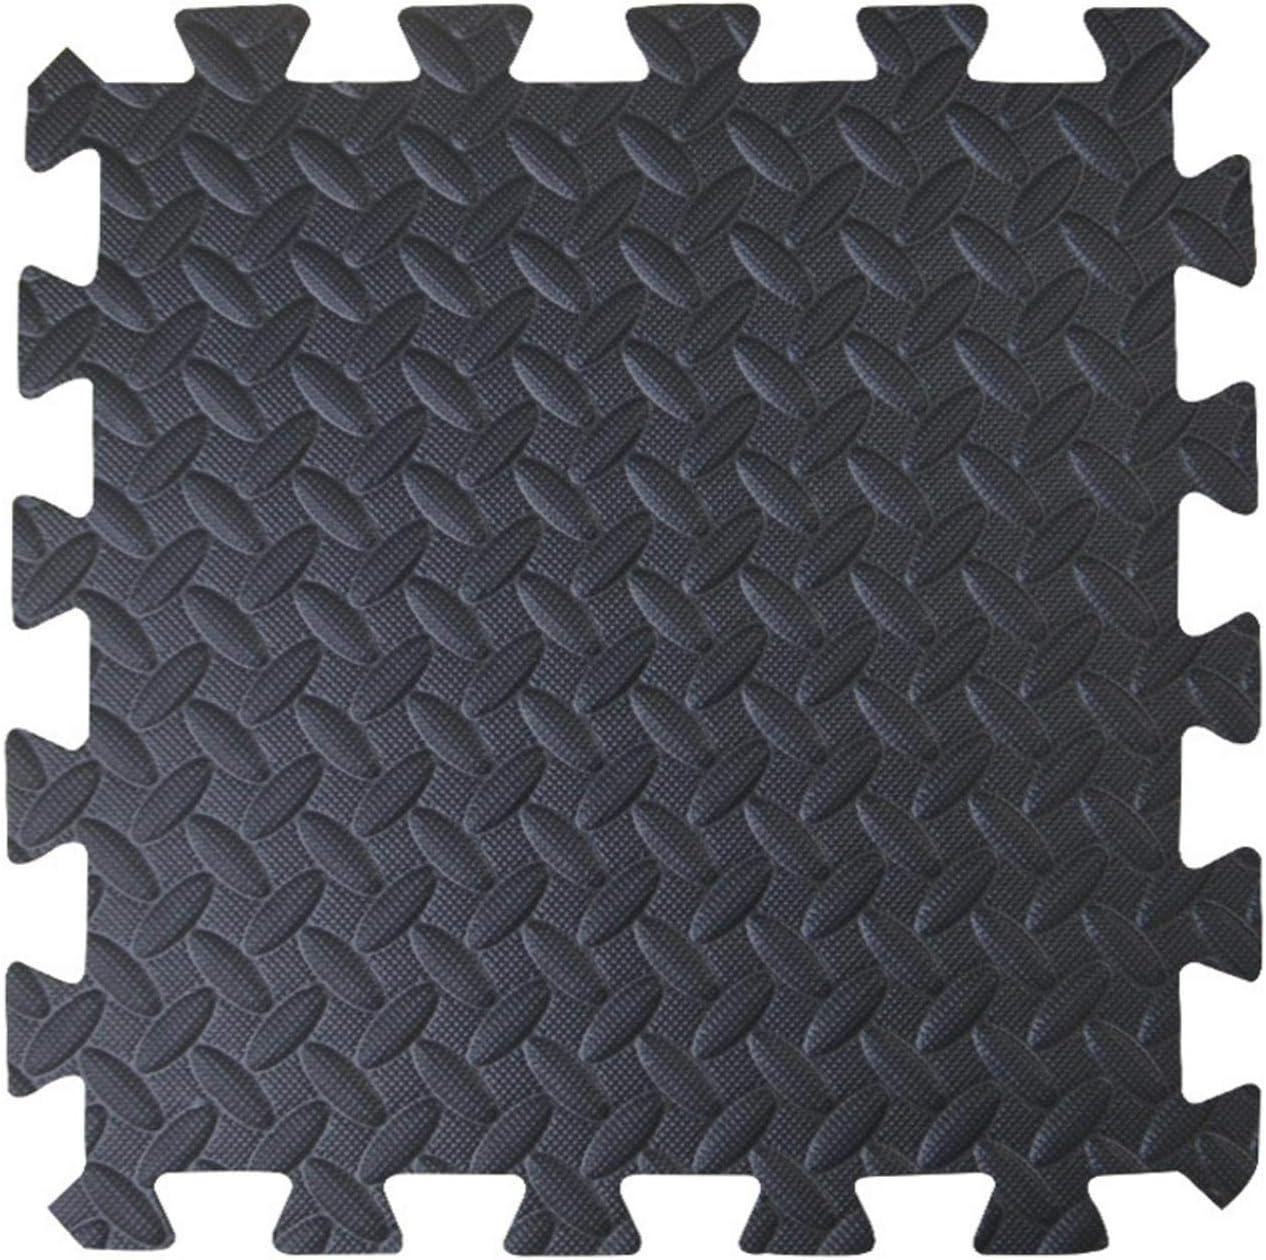 Gym Flooring Mats EVA Foam Interlocking Tiles for Home Gym Equipment Workout Covcow 12PCS Exercise Mats Puzzle Foam Mats